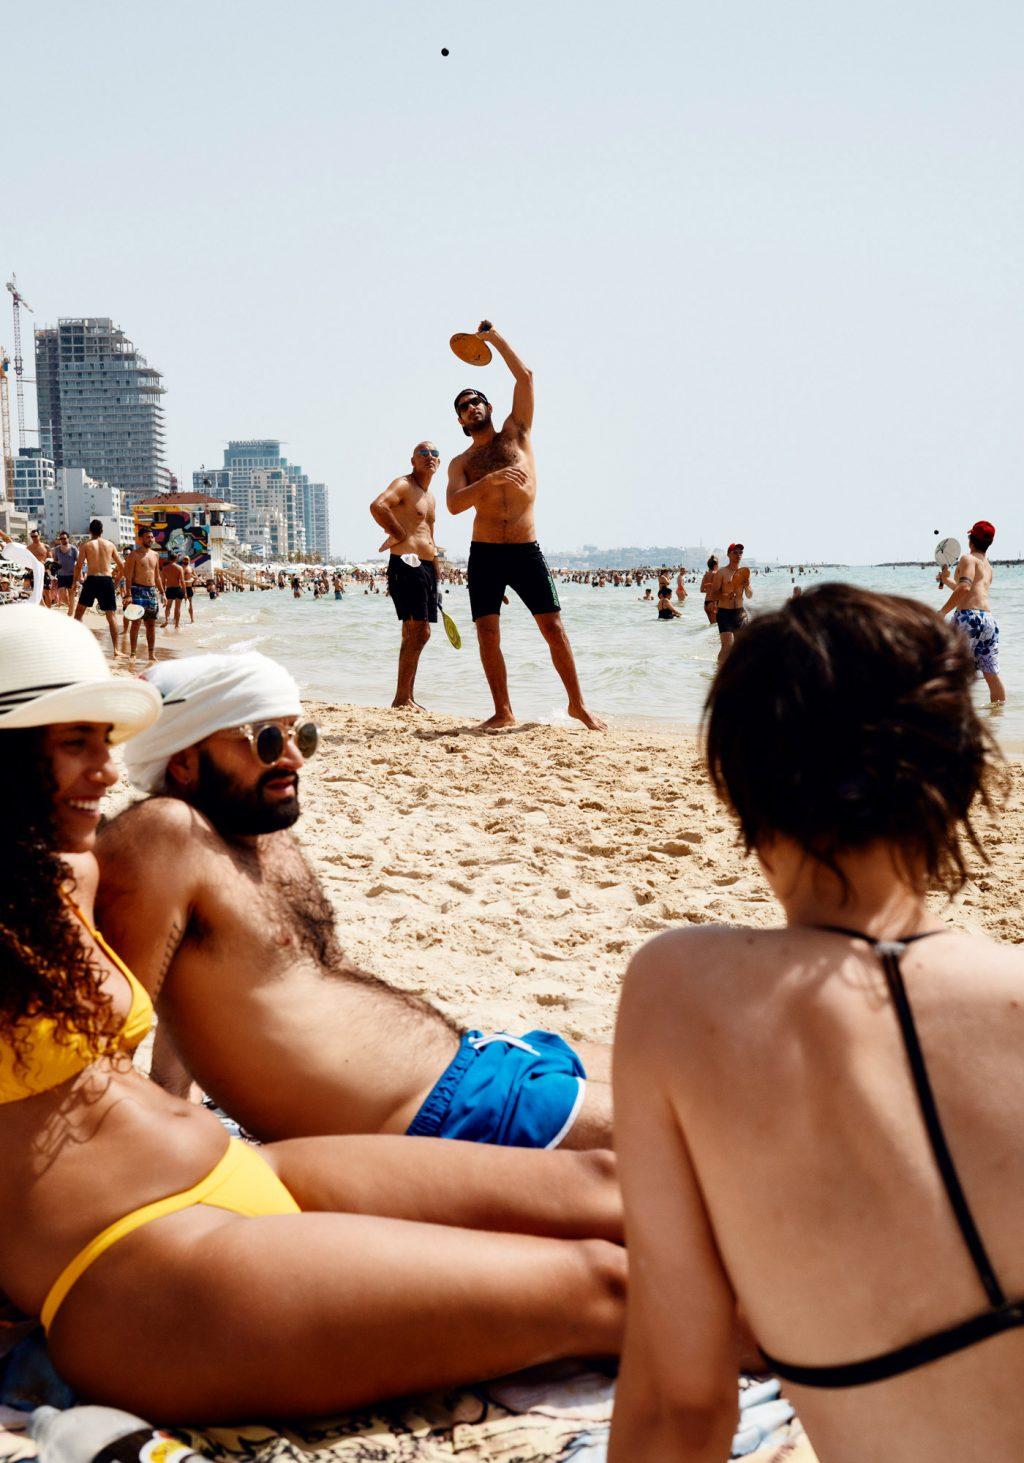 Tel Aviv, Israel Home Patrick Desbrosses